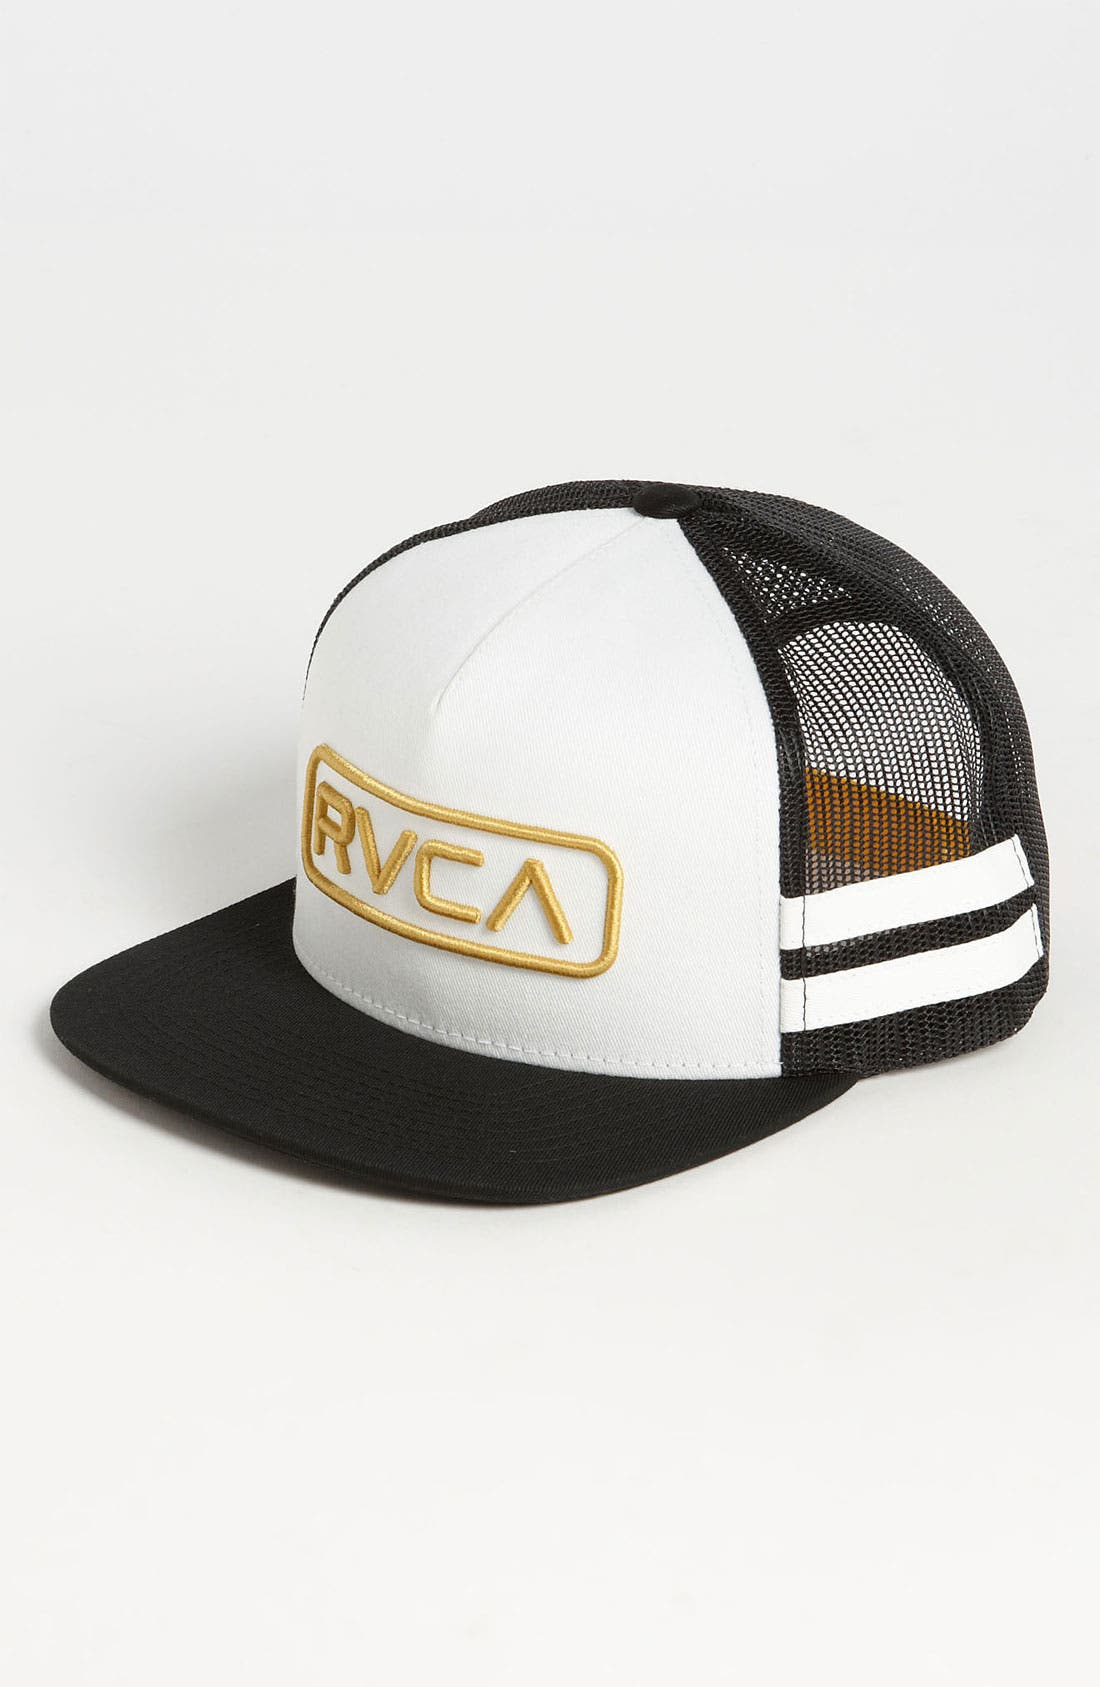 Alternate Image 1 Selected - RVCA 'Movement' Trucker Hat